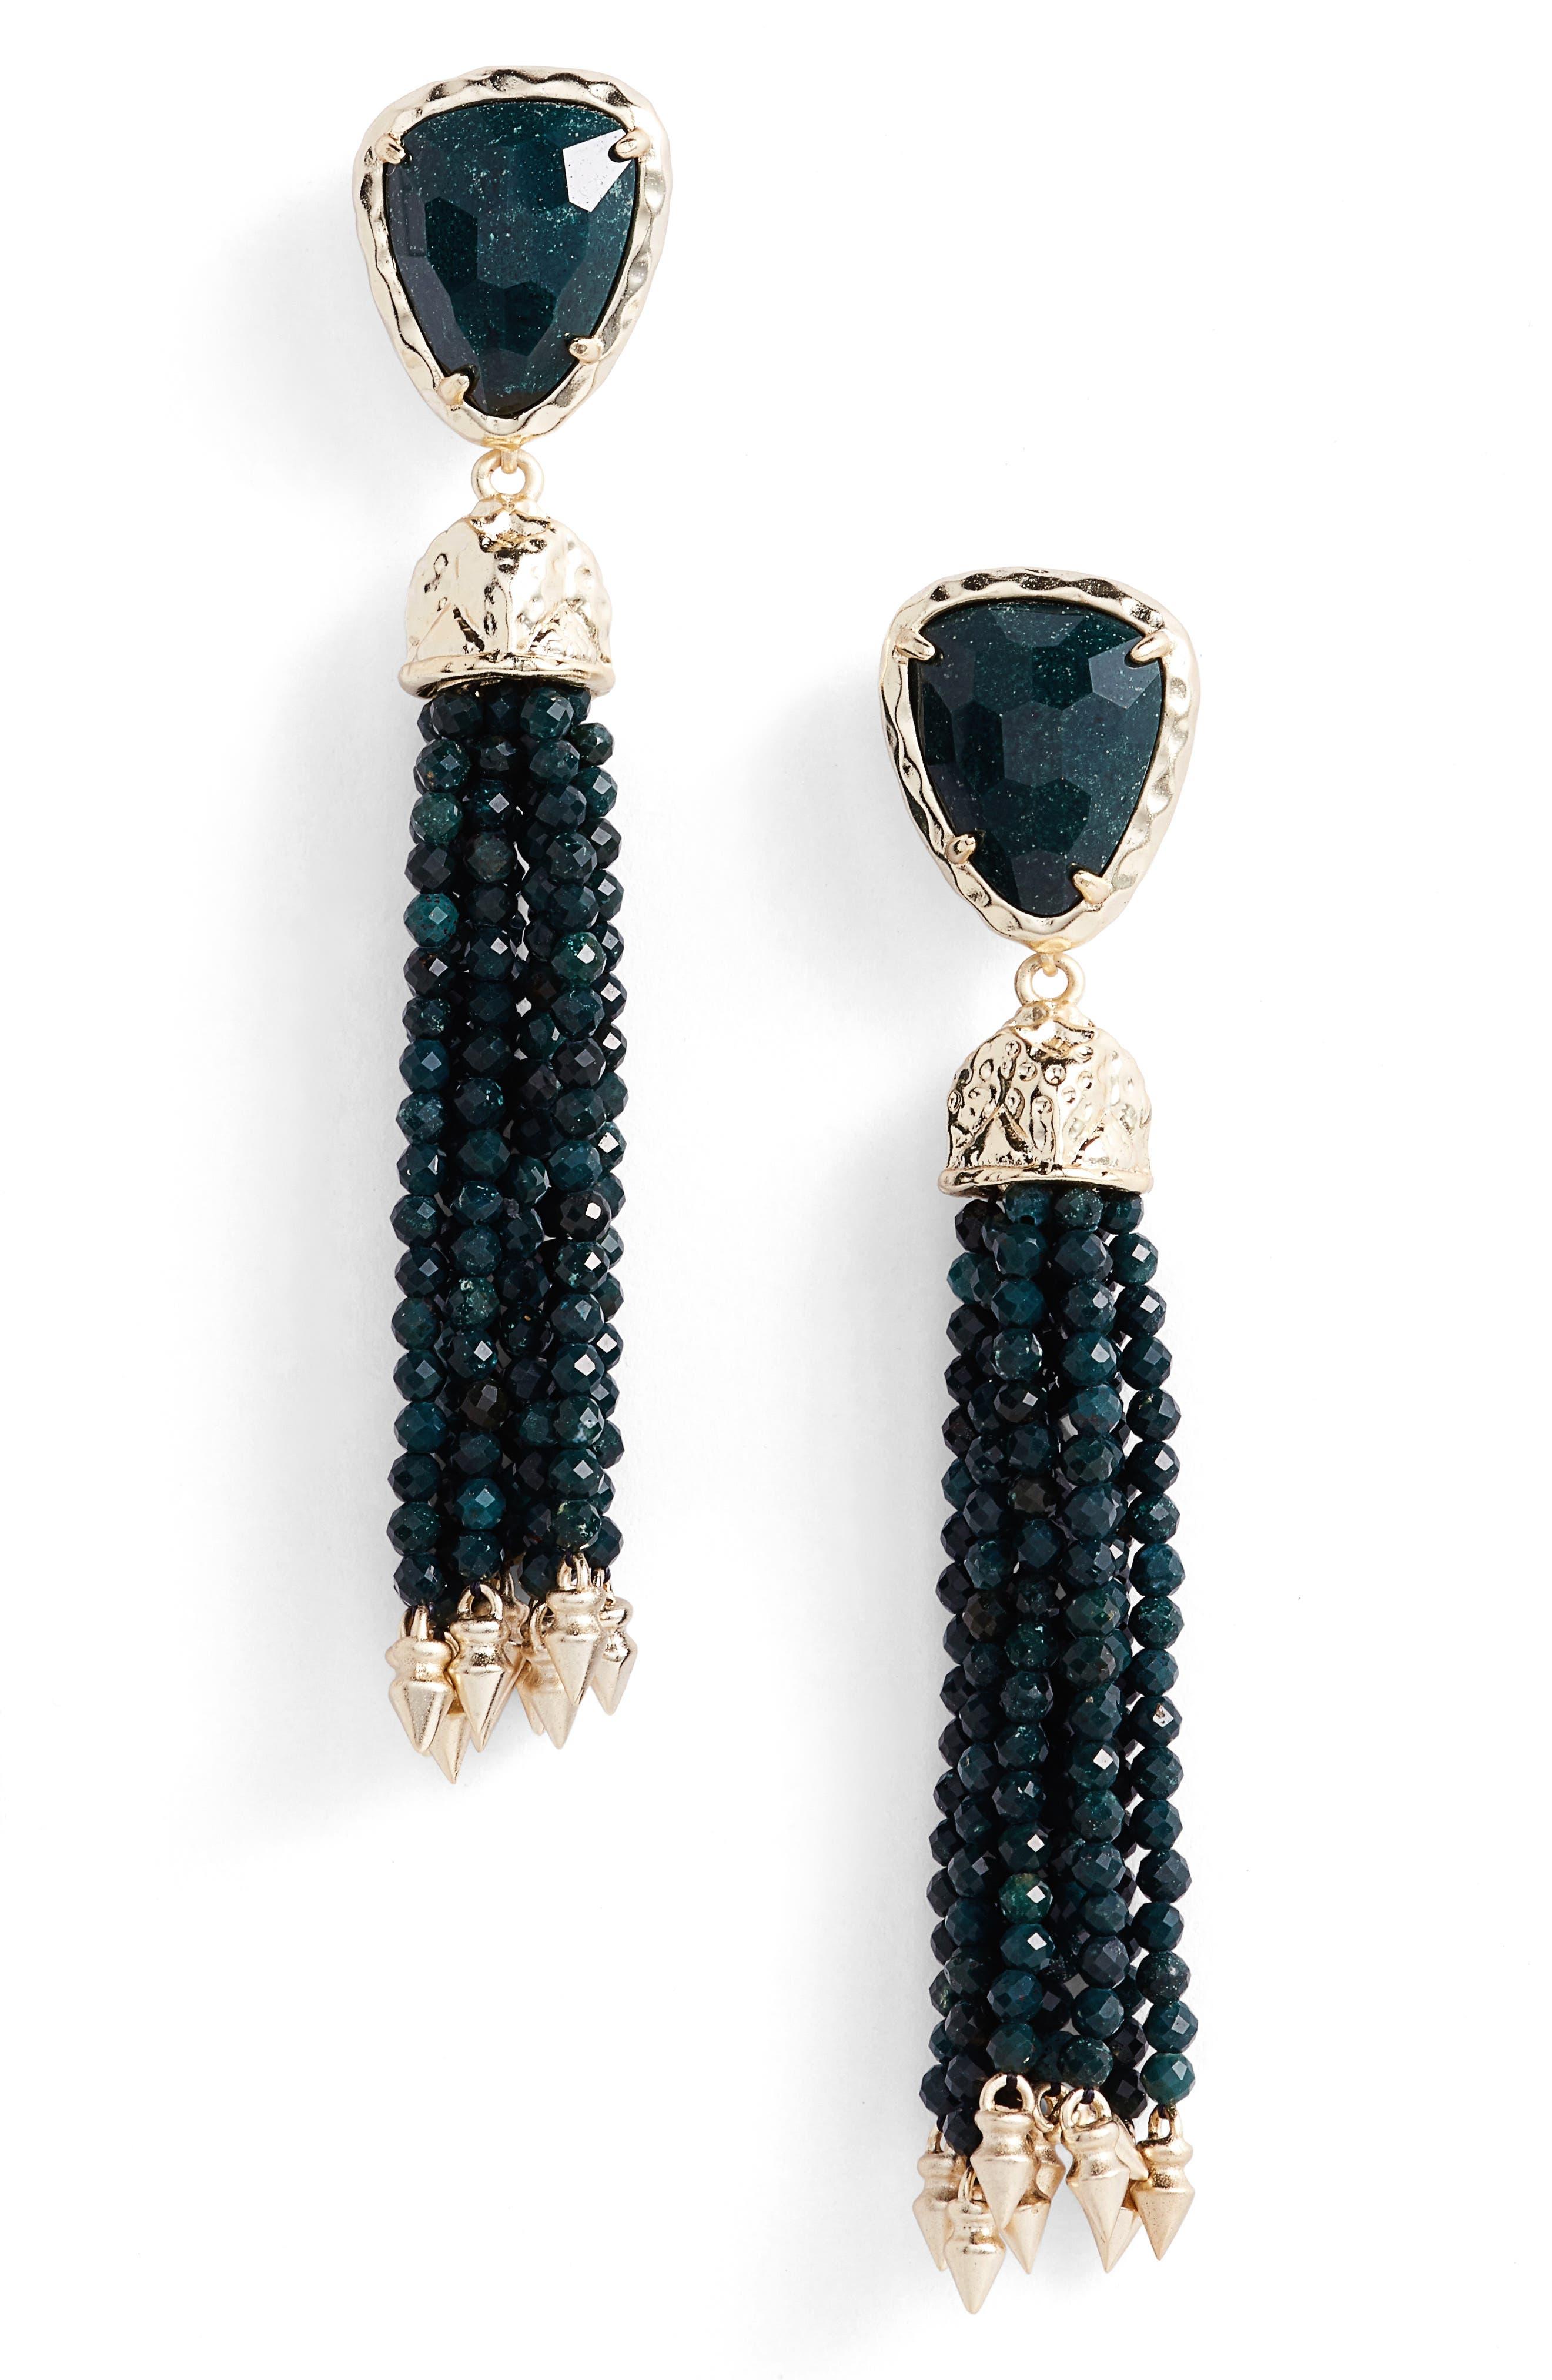 Blossom Tassel Drop Earrings,                         Main,                         color, Green Ocean Jasper/ Gold